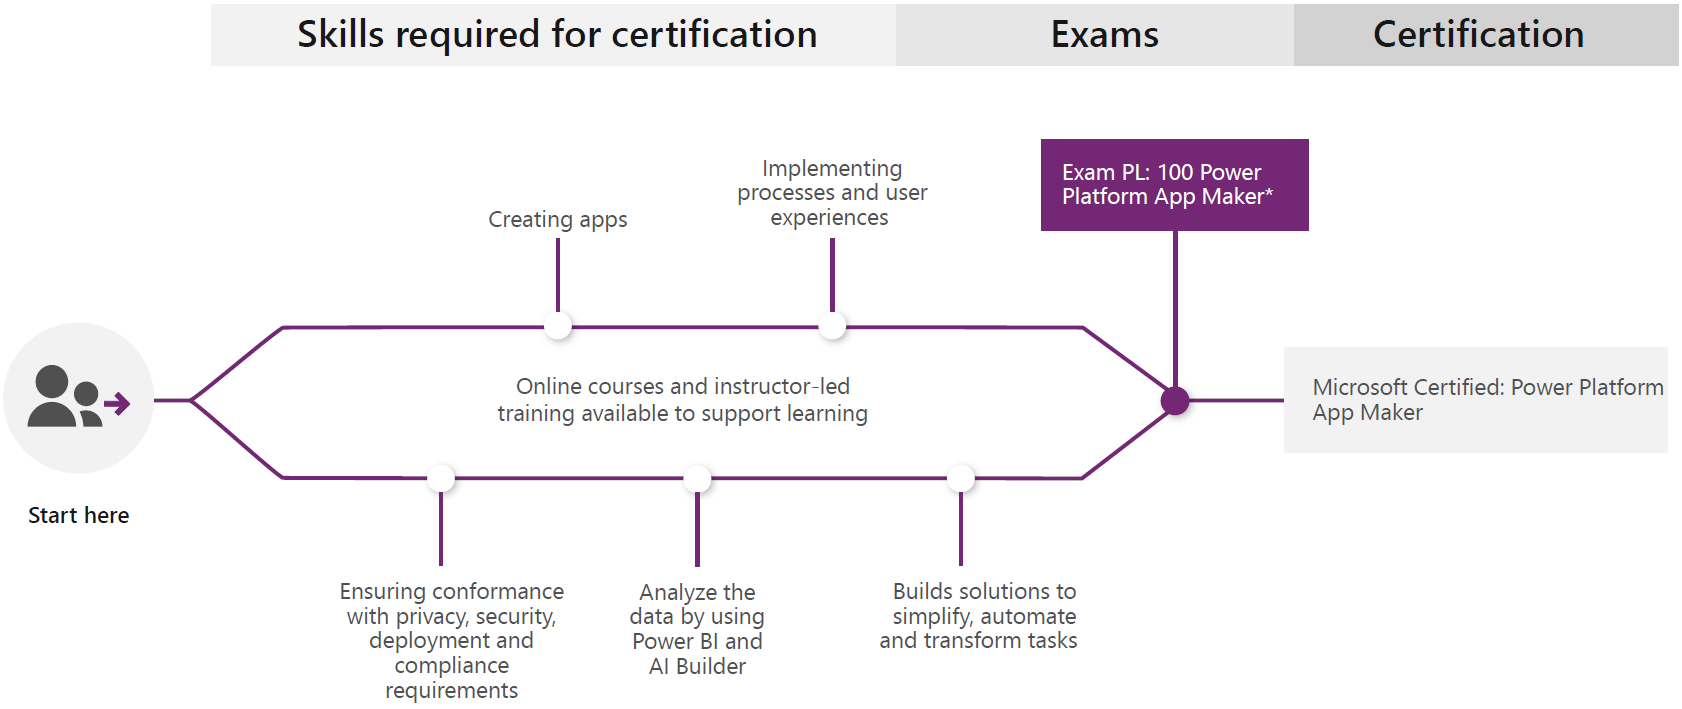 Learning Path for Microsoft Certified: Power Platform App Maker Associate